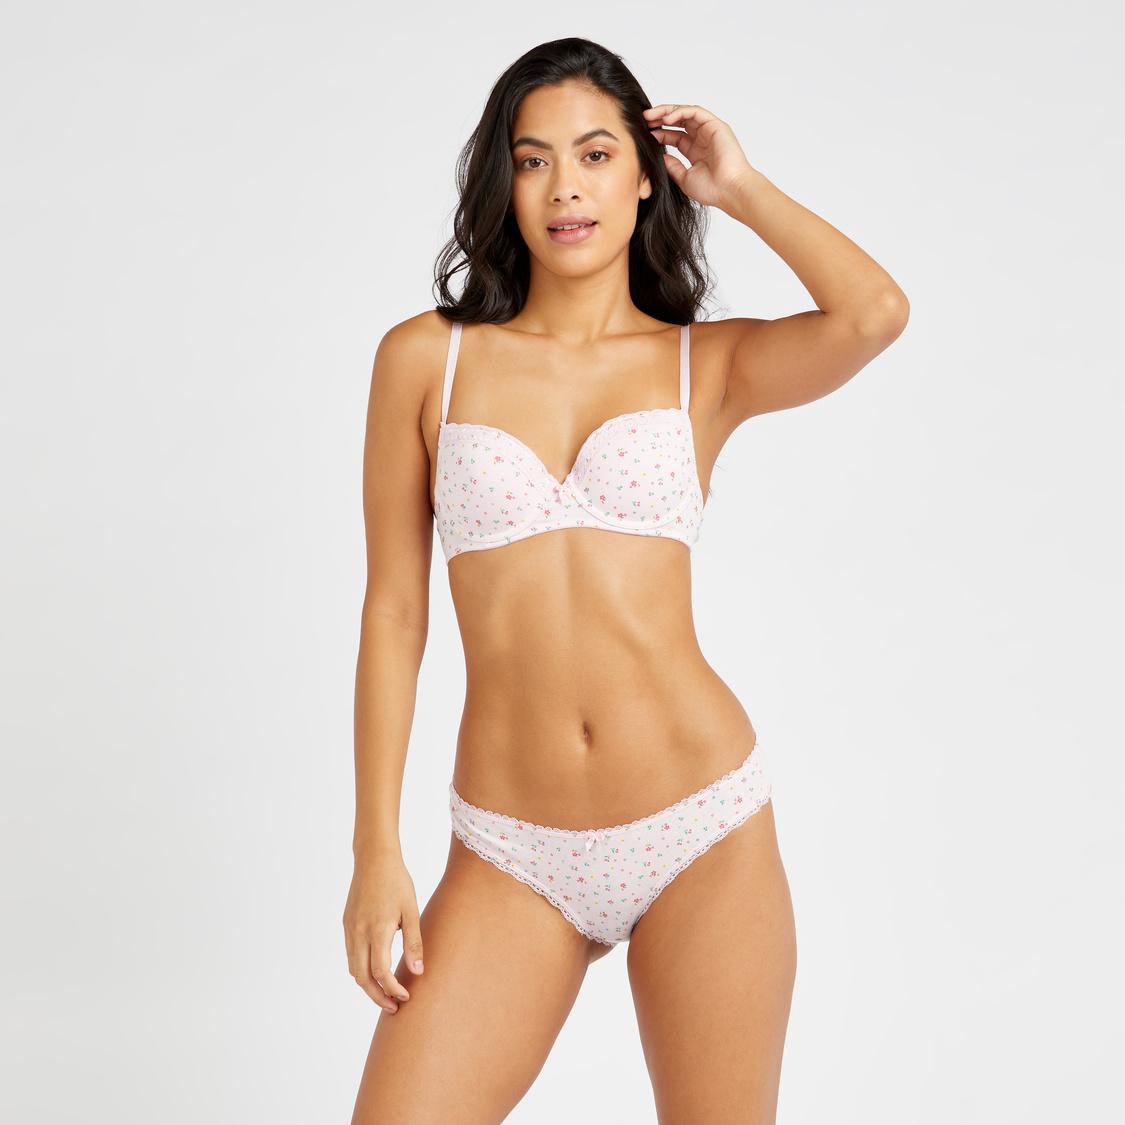 Floral Print Bikini Briefs with Lace Detail Elasticated Hem